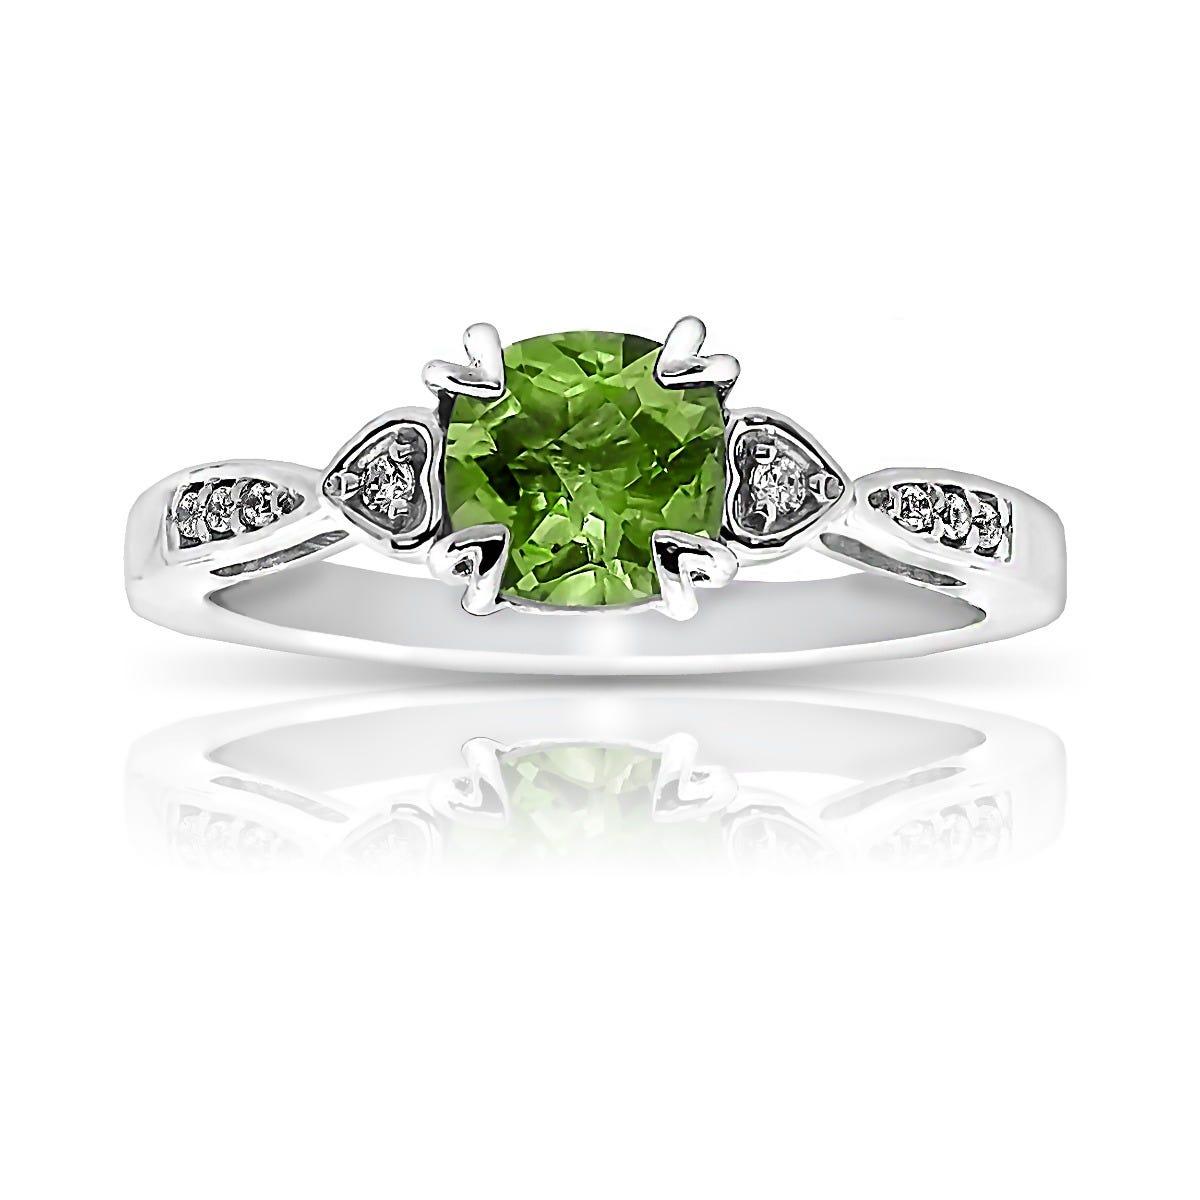 Peridot & Diamond 'Hearts' Ring in 10k White Gold